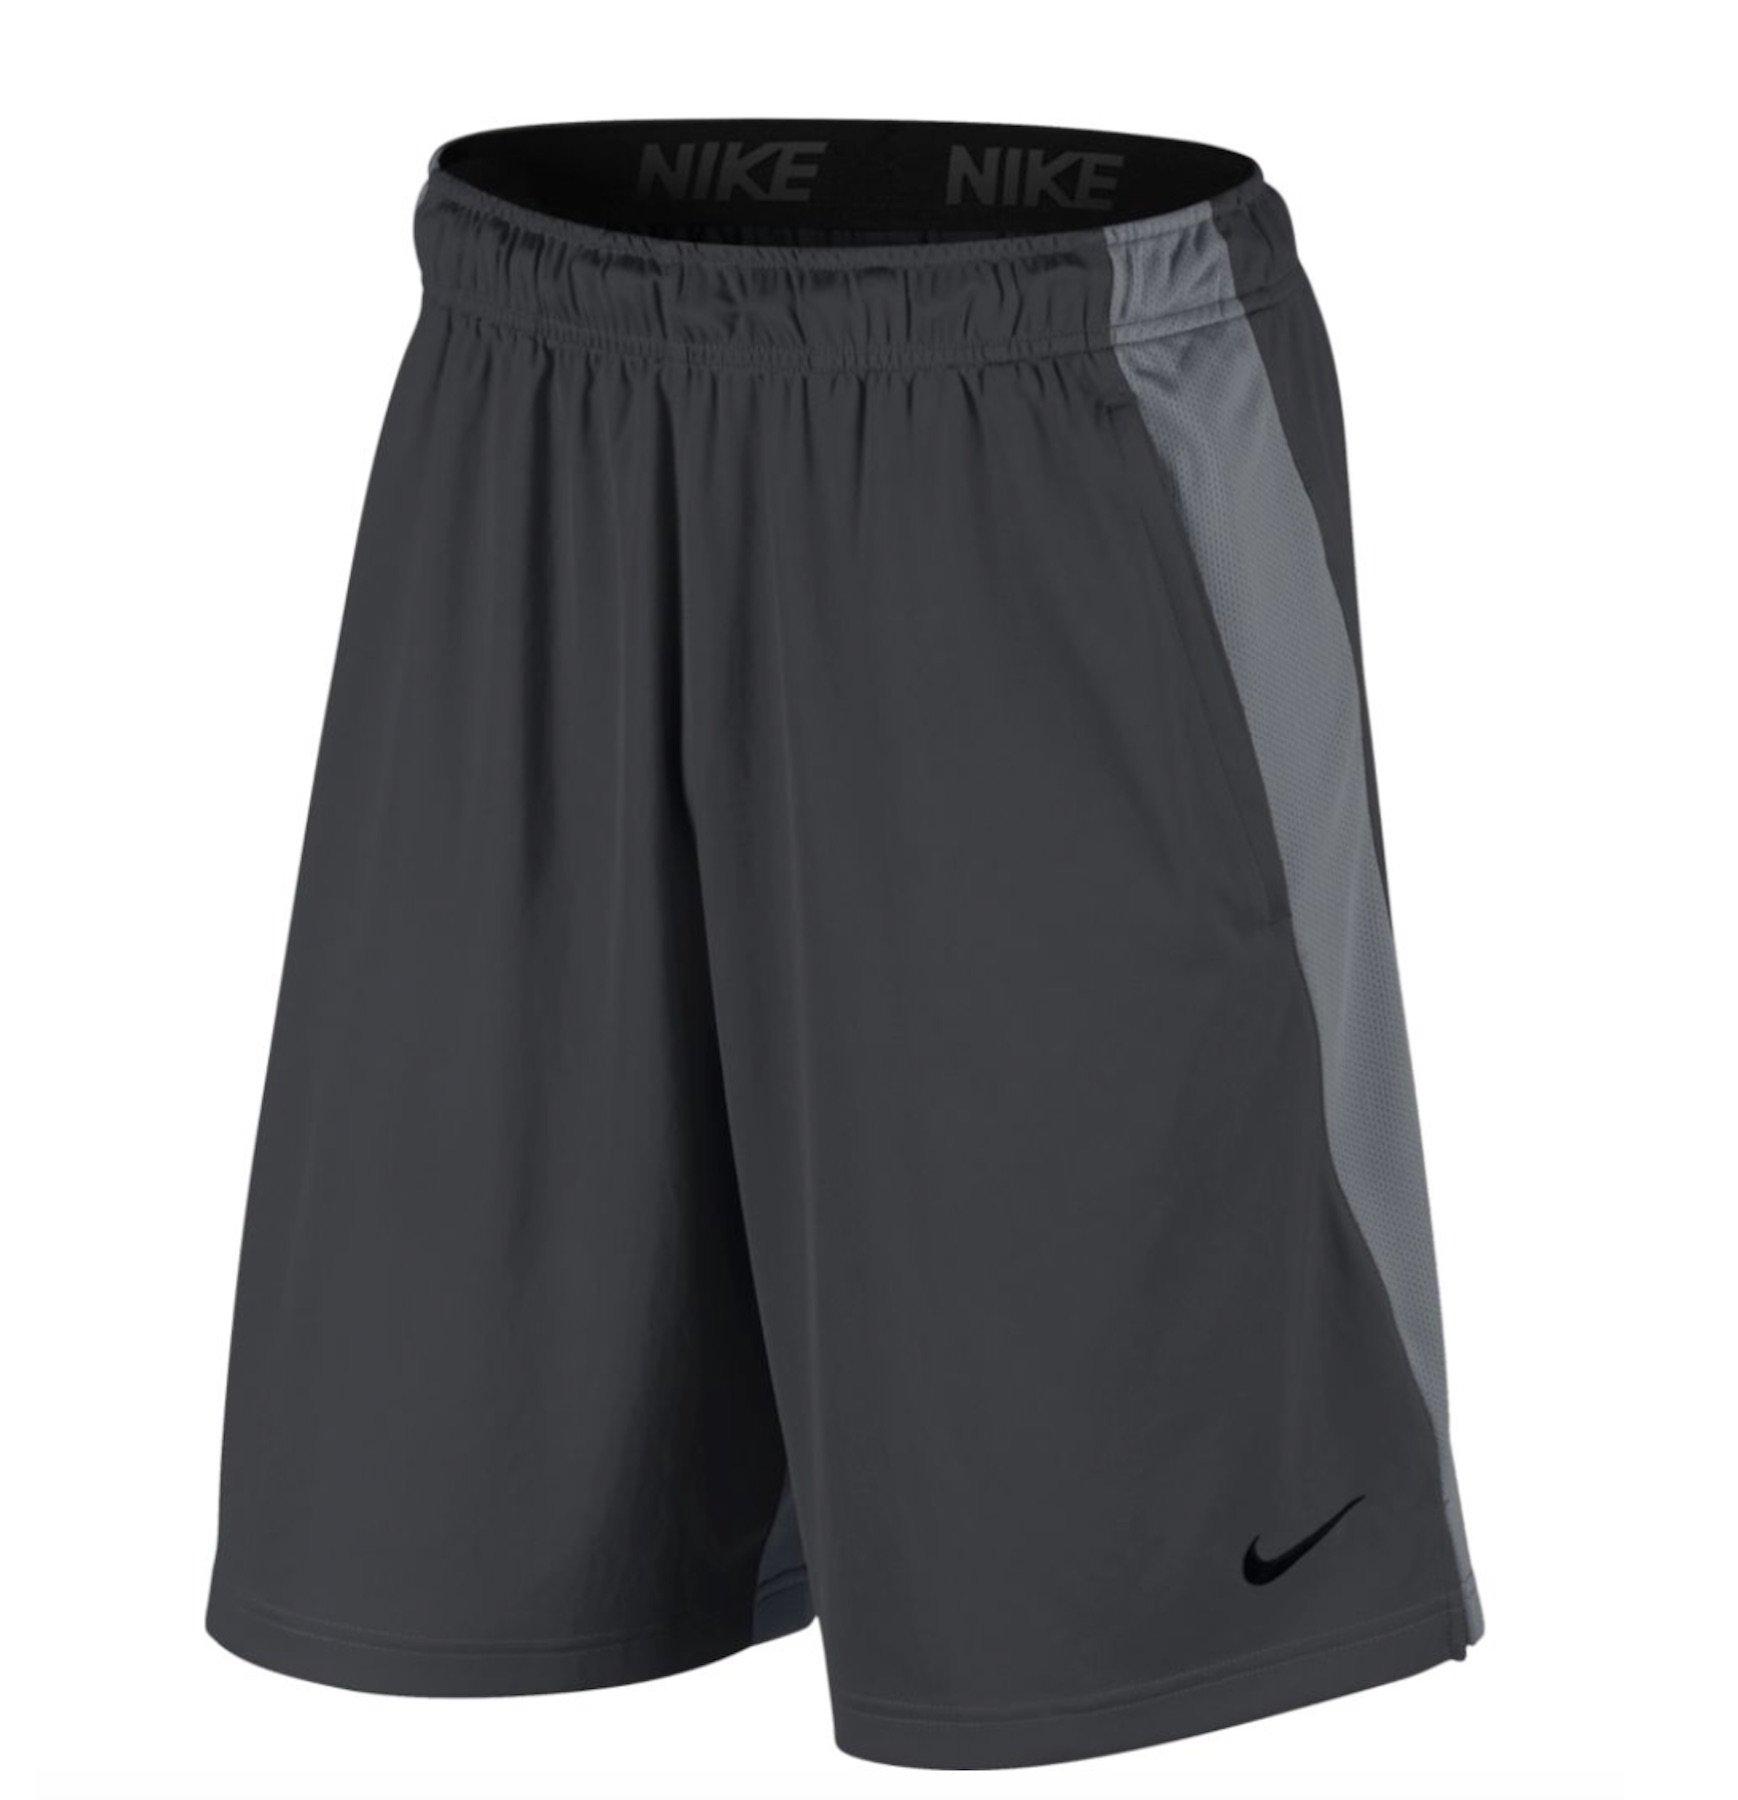 4d397e64eb Galleon - NIKE Men s Dry Hybrid Running Shorts (XL X 9